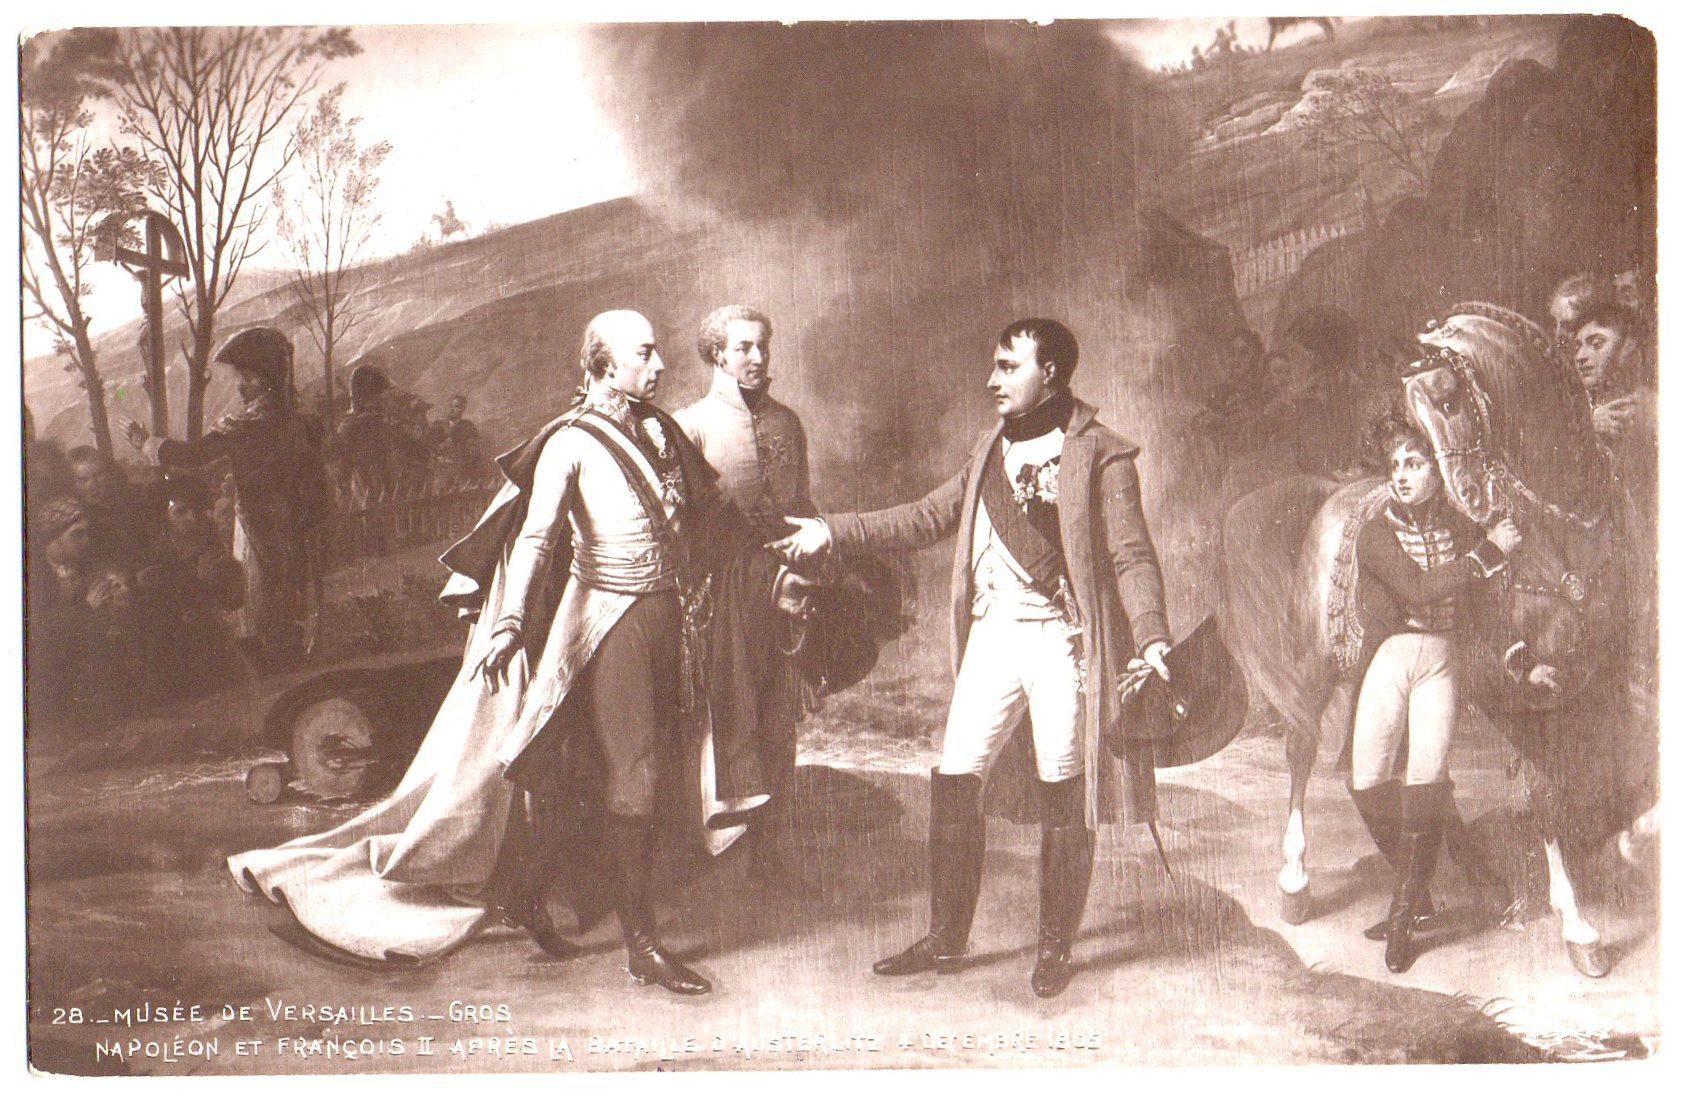 "Поштова листівка. ""Musée de Versailles._Gros. Napoléon et François II après la bataille d'Austerlitz. 4 December 1805 / Музей ""Версаль"". Грос. Наполеон і Франциск II після битви при Аустерліці. 4 грудня 1805 р."""